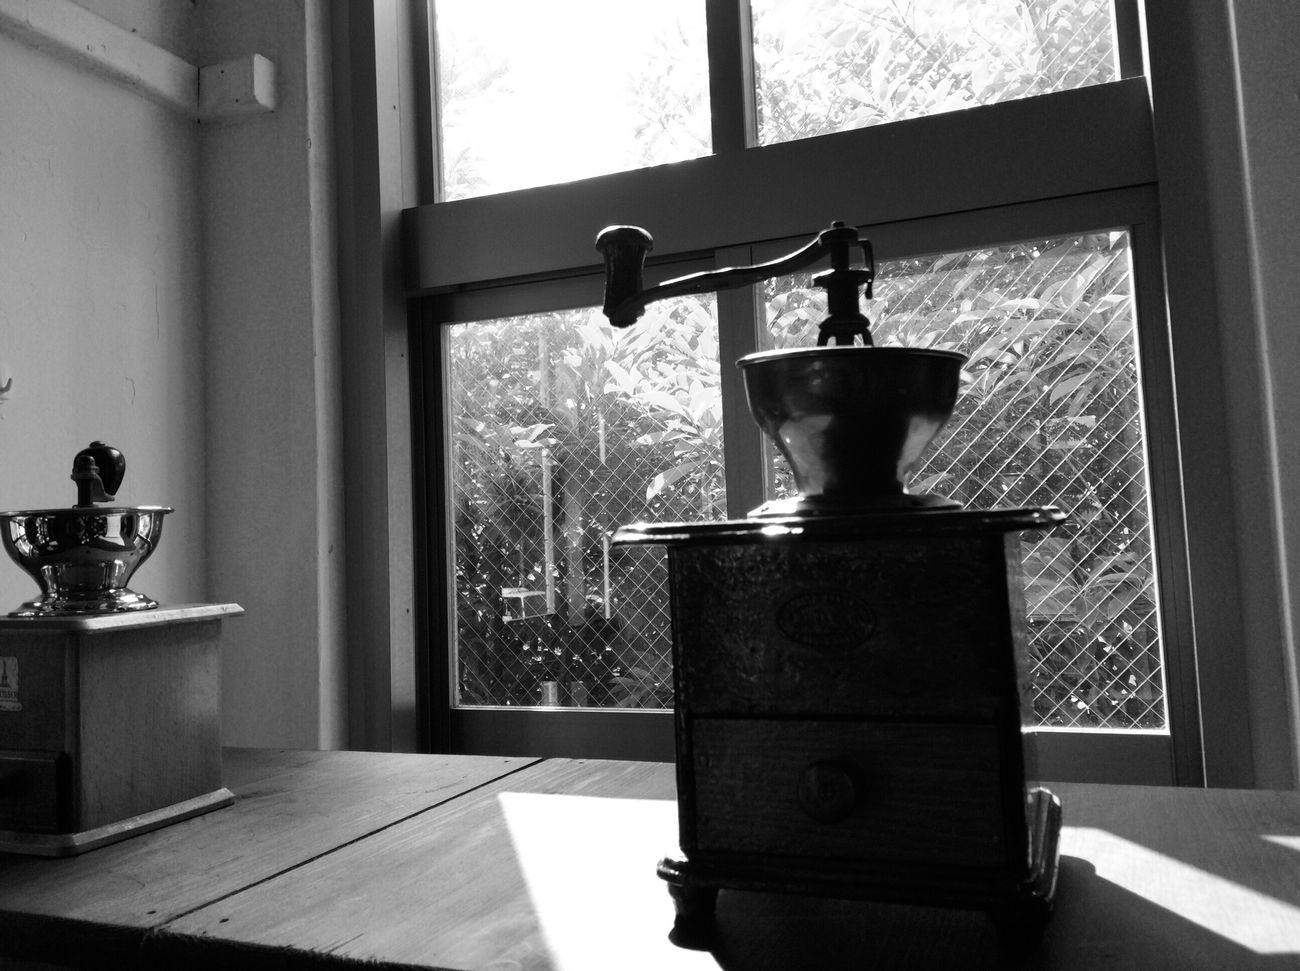 Ricoh Gr Original EyeEm Best Shots Bw_collection Blackandwhite Light And Shadow Yokohama BLAUBERG An Der KUSTE Select Shop